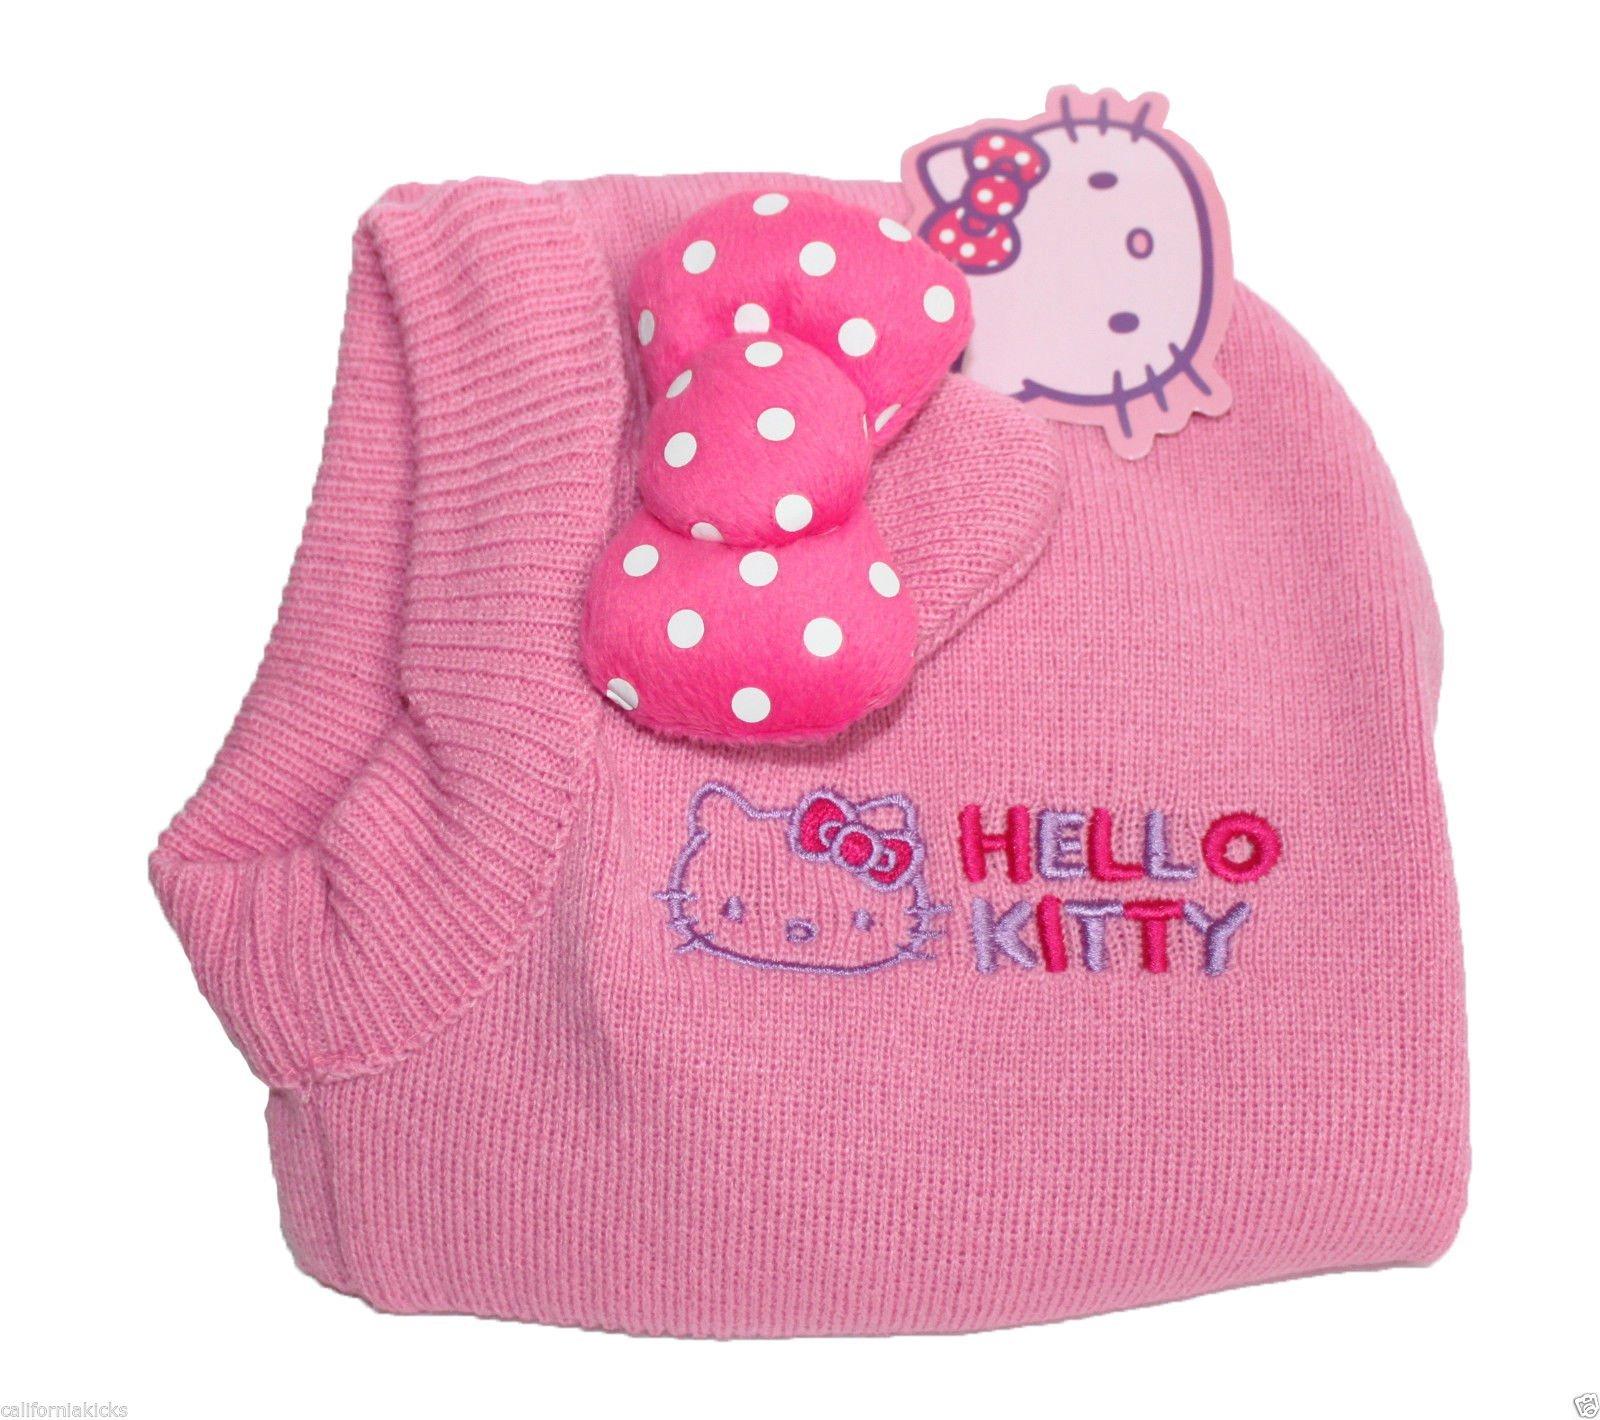 f5af59e09 Sanrio Girl s Hello Kitty Balaclava Toddler and 37 similar items. 81pq  kapv5l